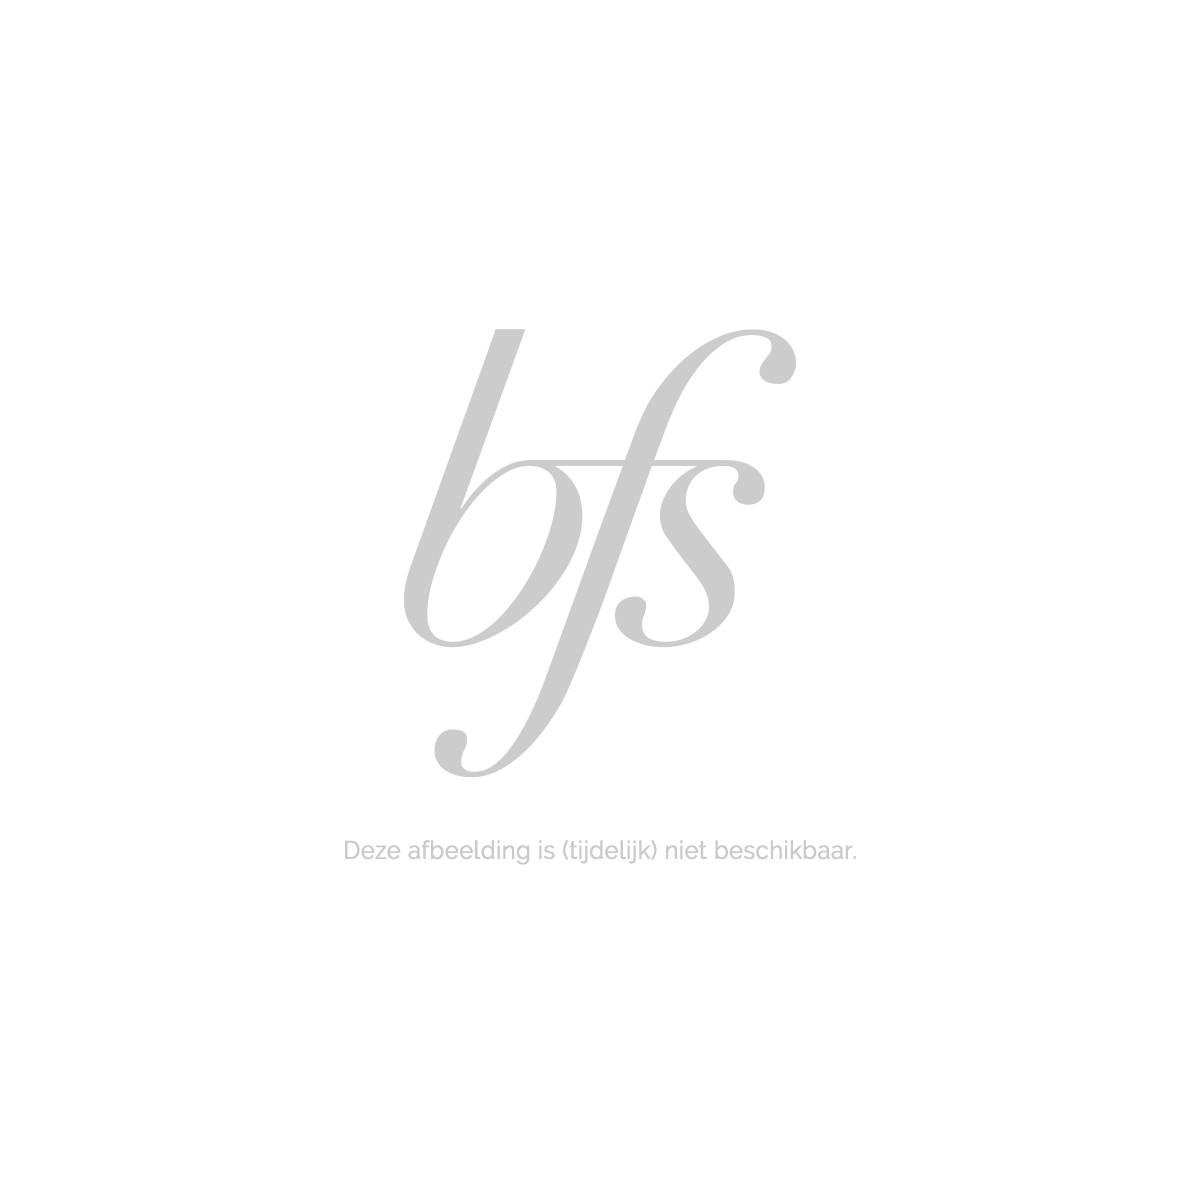 Diva Professional Styling Rebel Edition Intelligent Digital Titanium Wand Krultang 25-13Mm